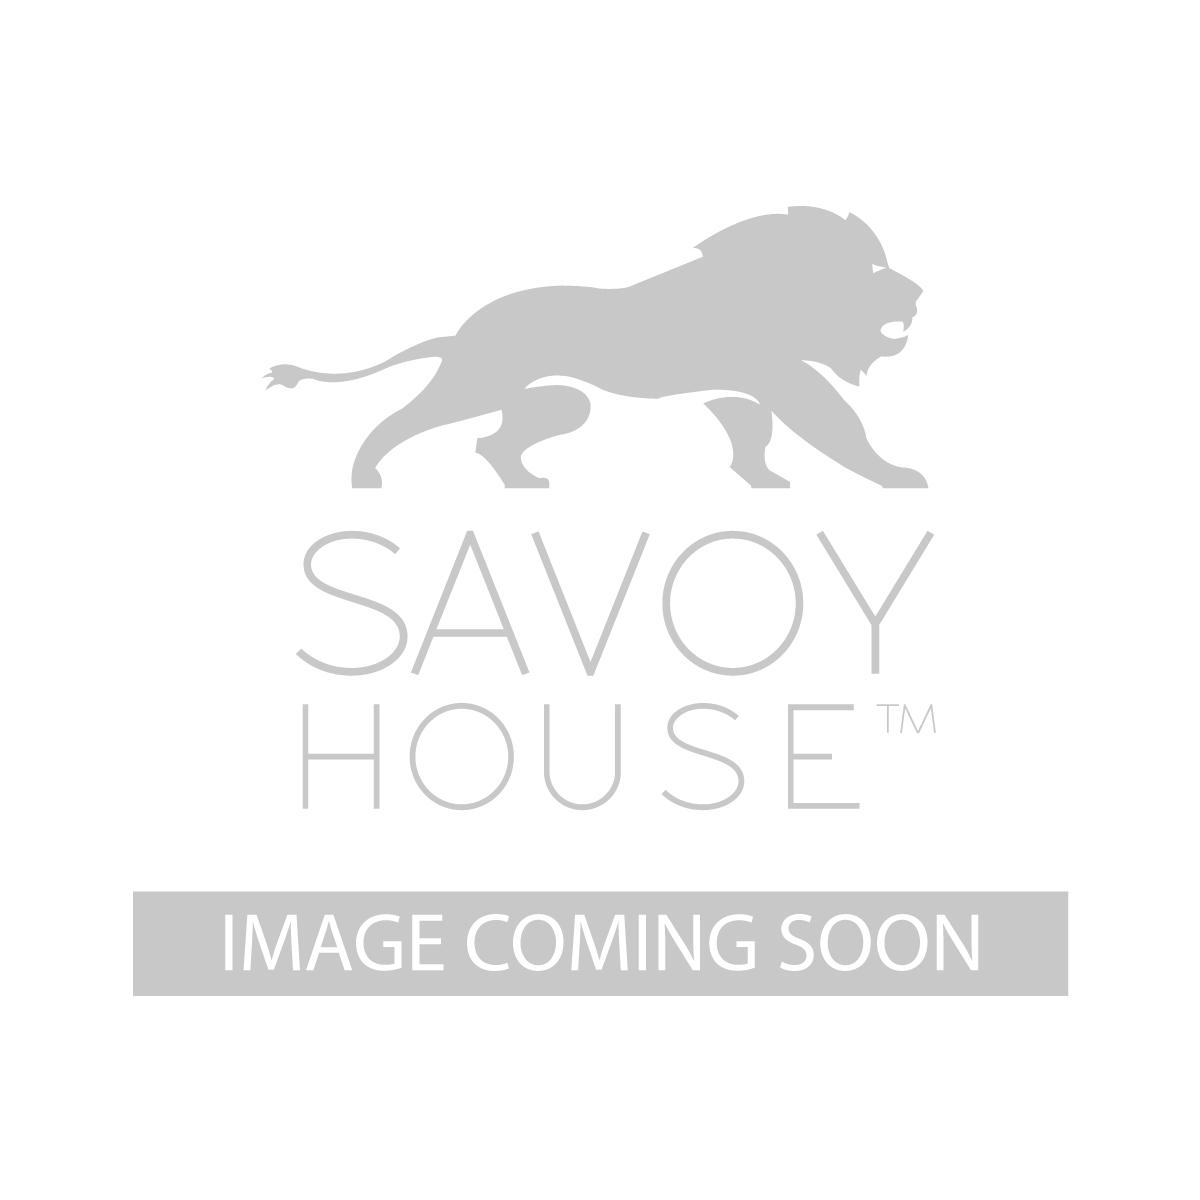 8 338 4 13 colton 4 light bath bar by savoy house colton 4 light bath bar aloadofball Images